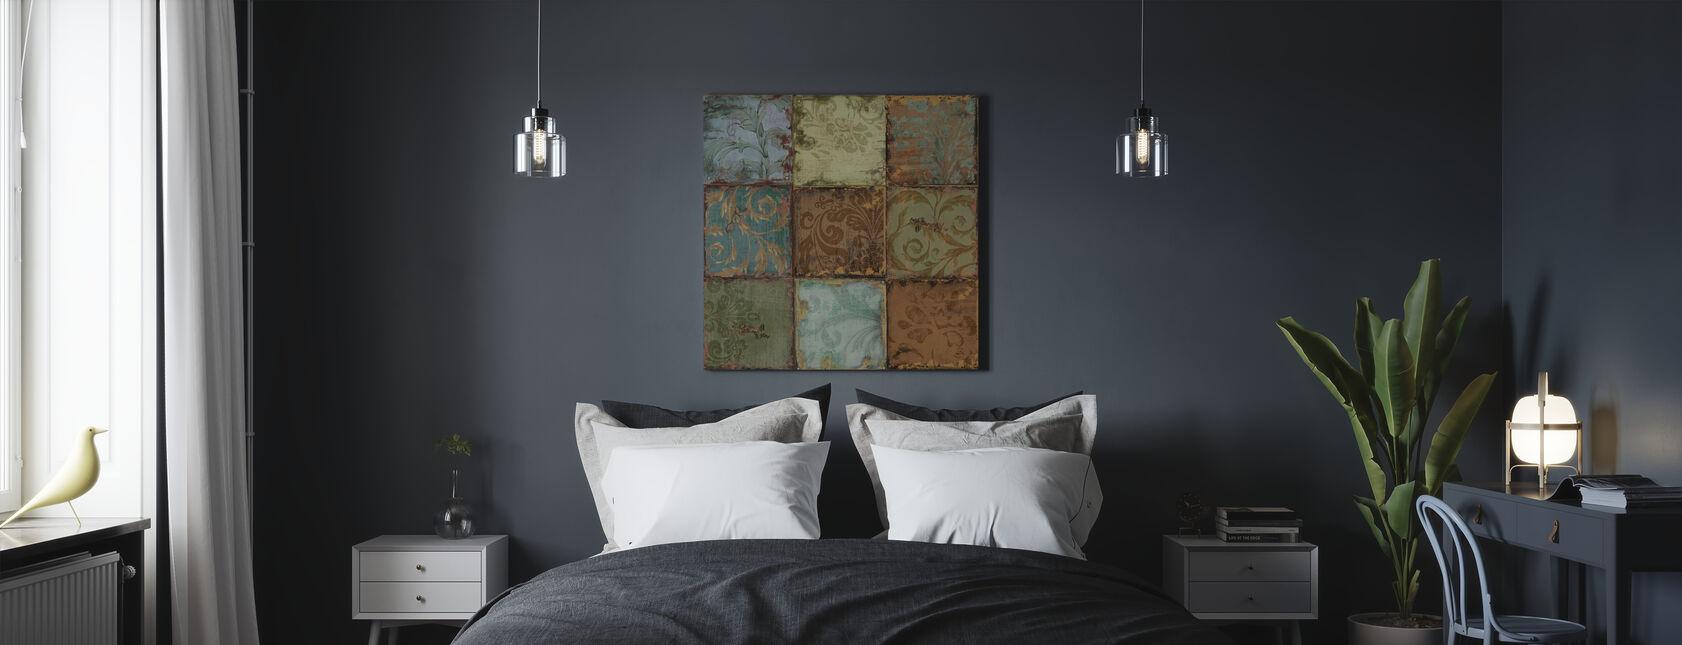 Tapestry Tegels 1 - Canvas print - Slaapkamer